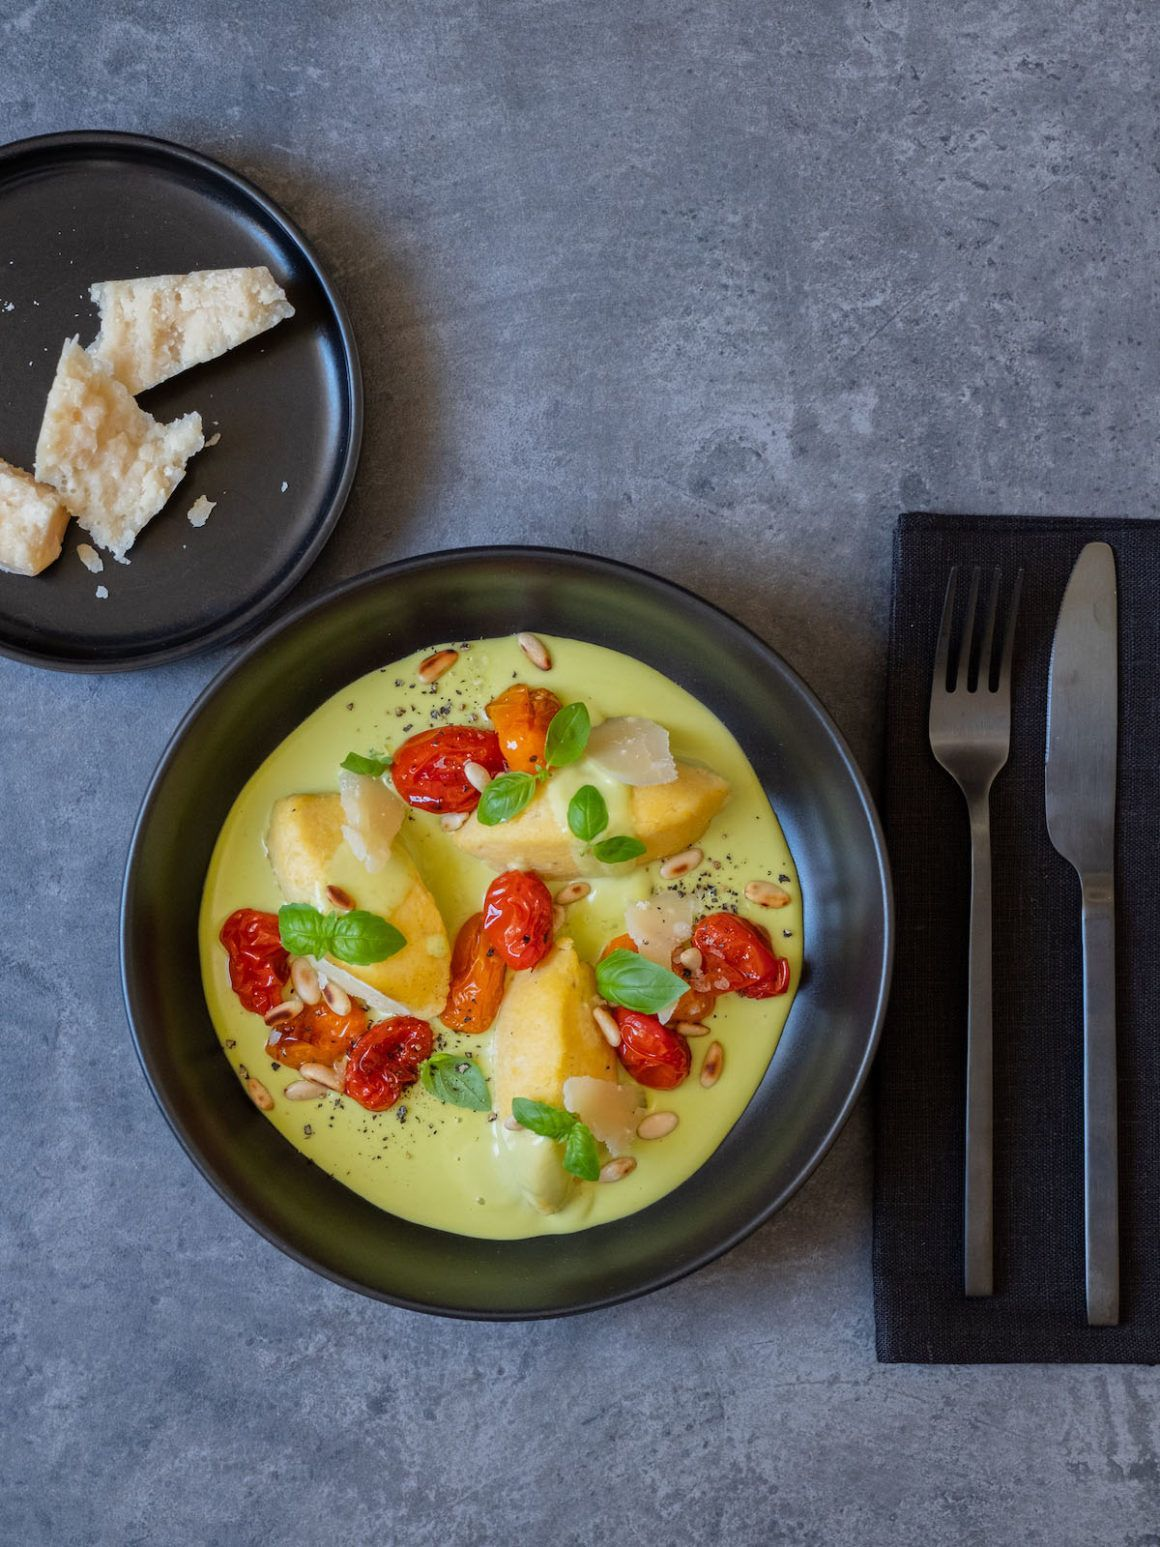 About Fuel, Foodblog, Rezept, Parmesan, Parmigiano Reggiano, Pinienkerne